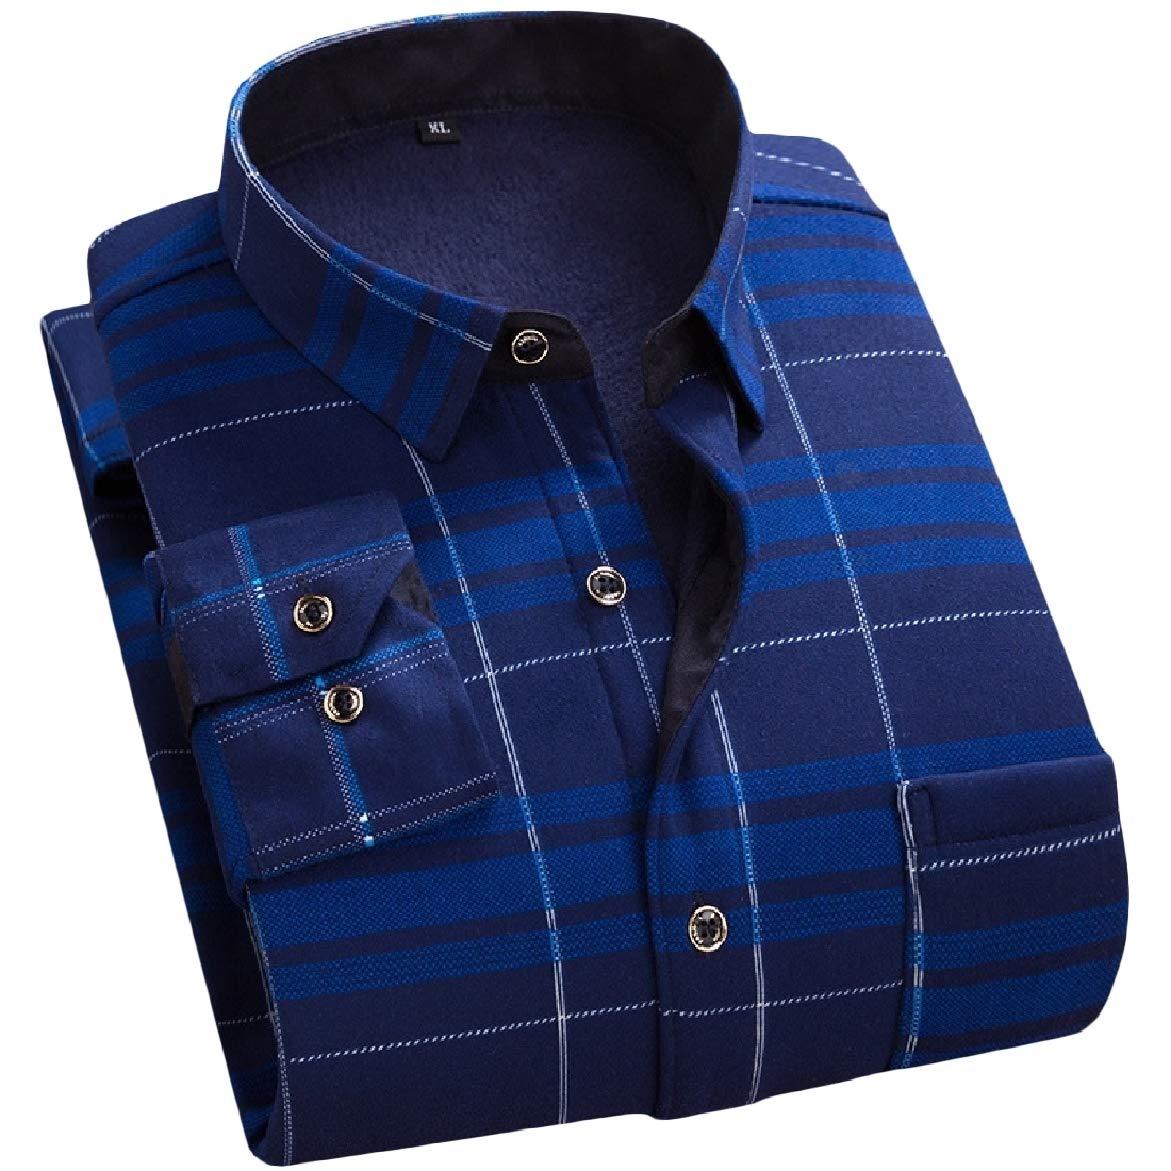 SportsX Mens Office Plaid Thicken Plus Velvet Comfort Dress Shirts